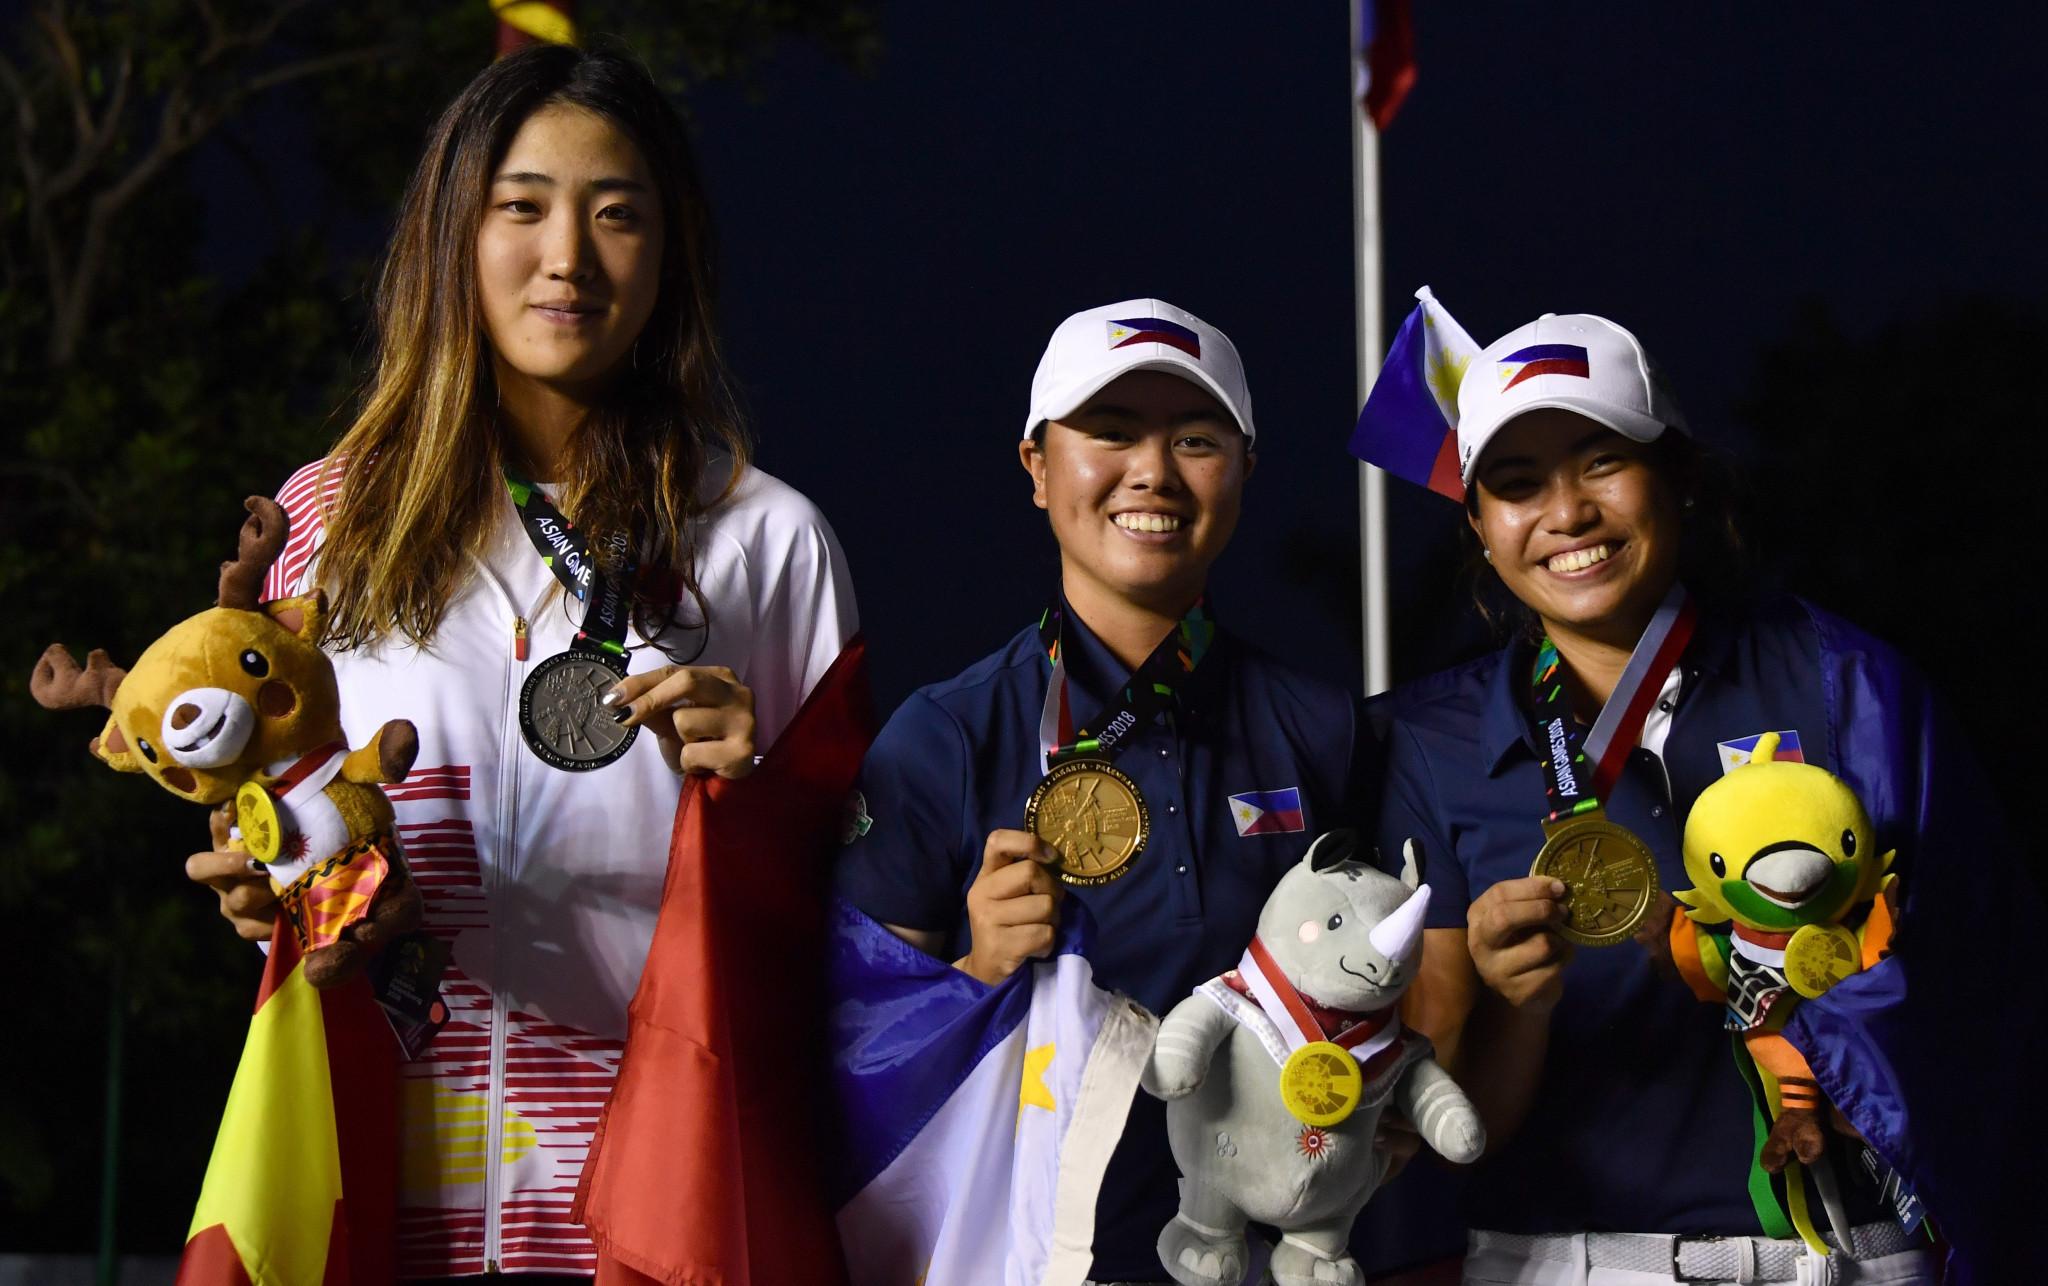 Yuka Saso won two gold medals in golf at Jakarta Palembang 2018 ©Getty Images